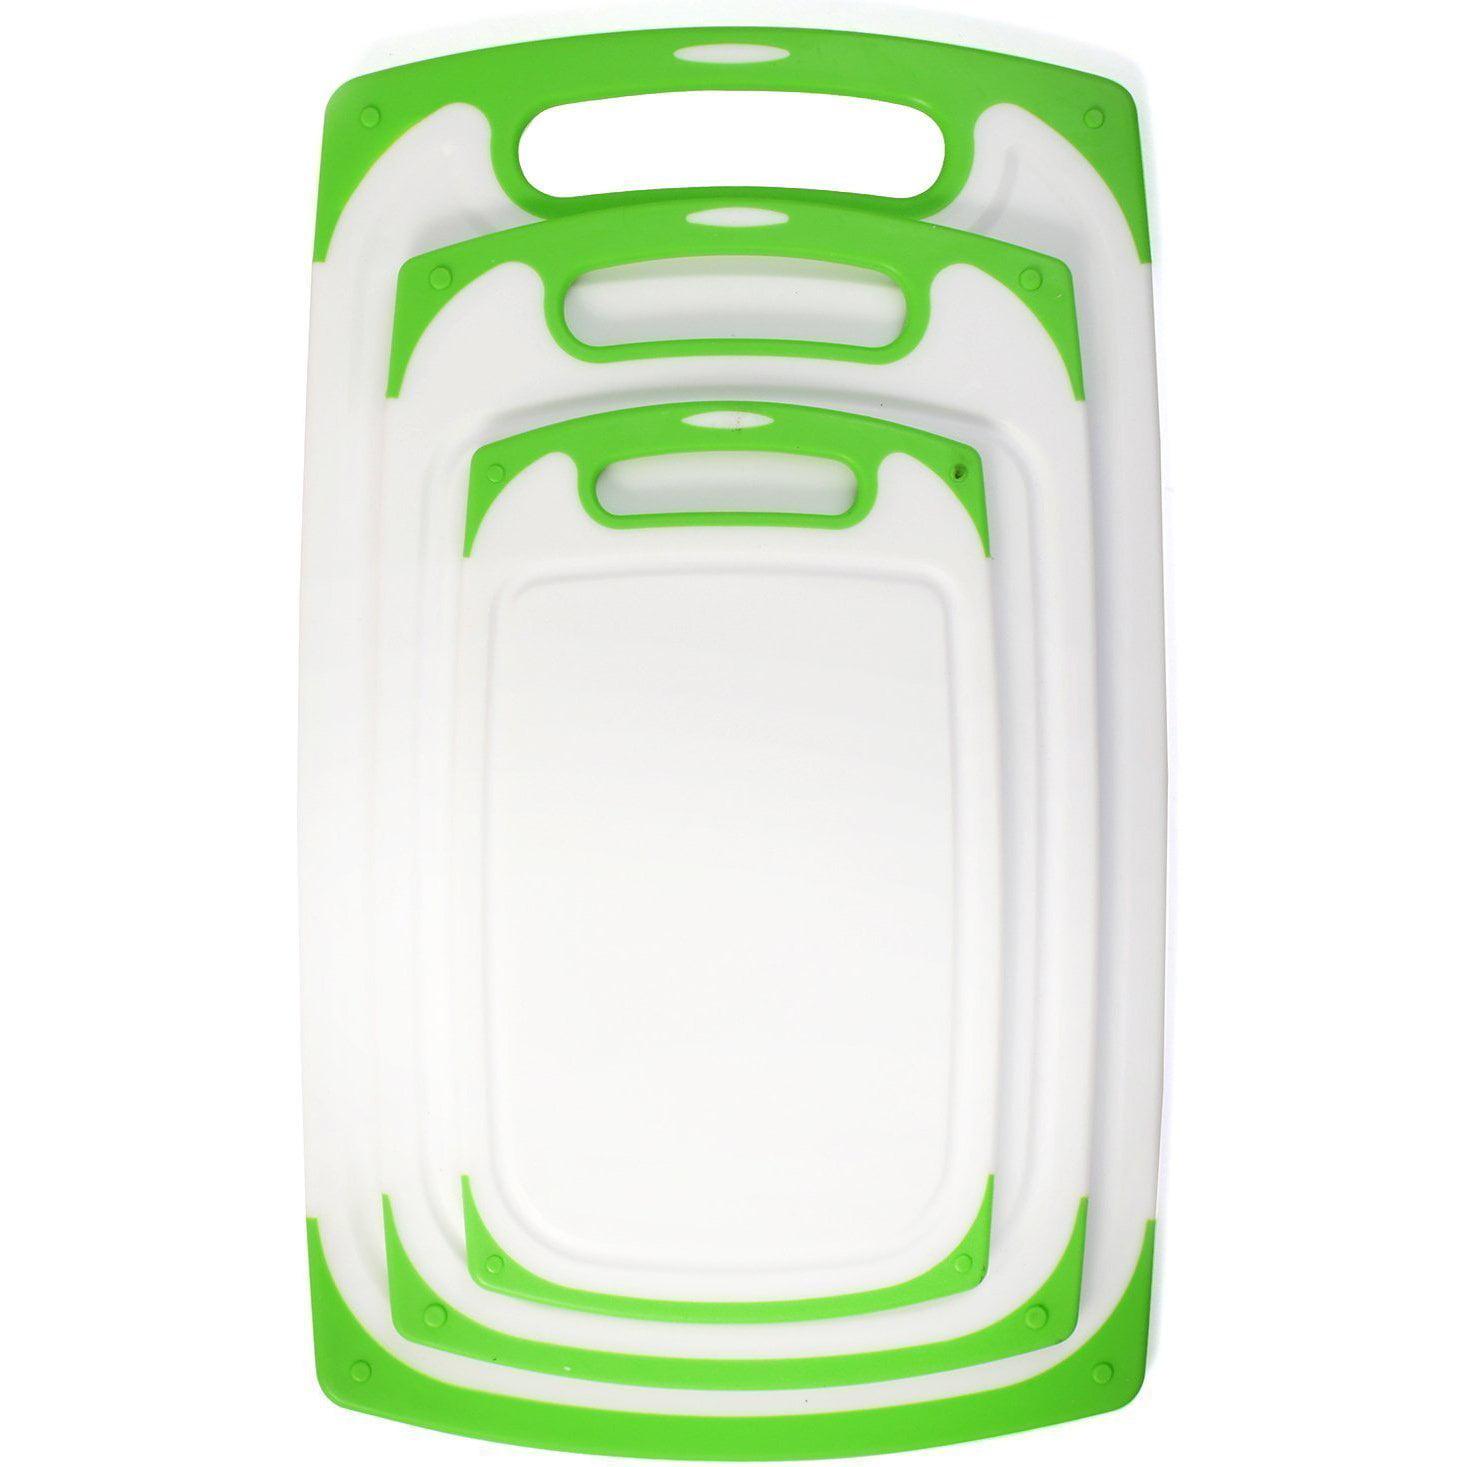 Belwares 3-Piece Dishwasher-Safe Plastic Cutting Board Set with Non-Slip